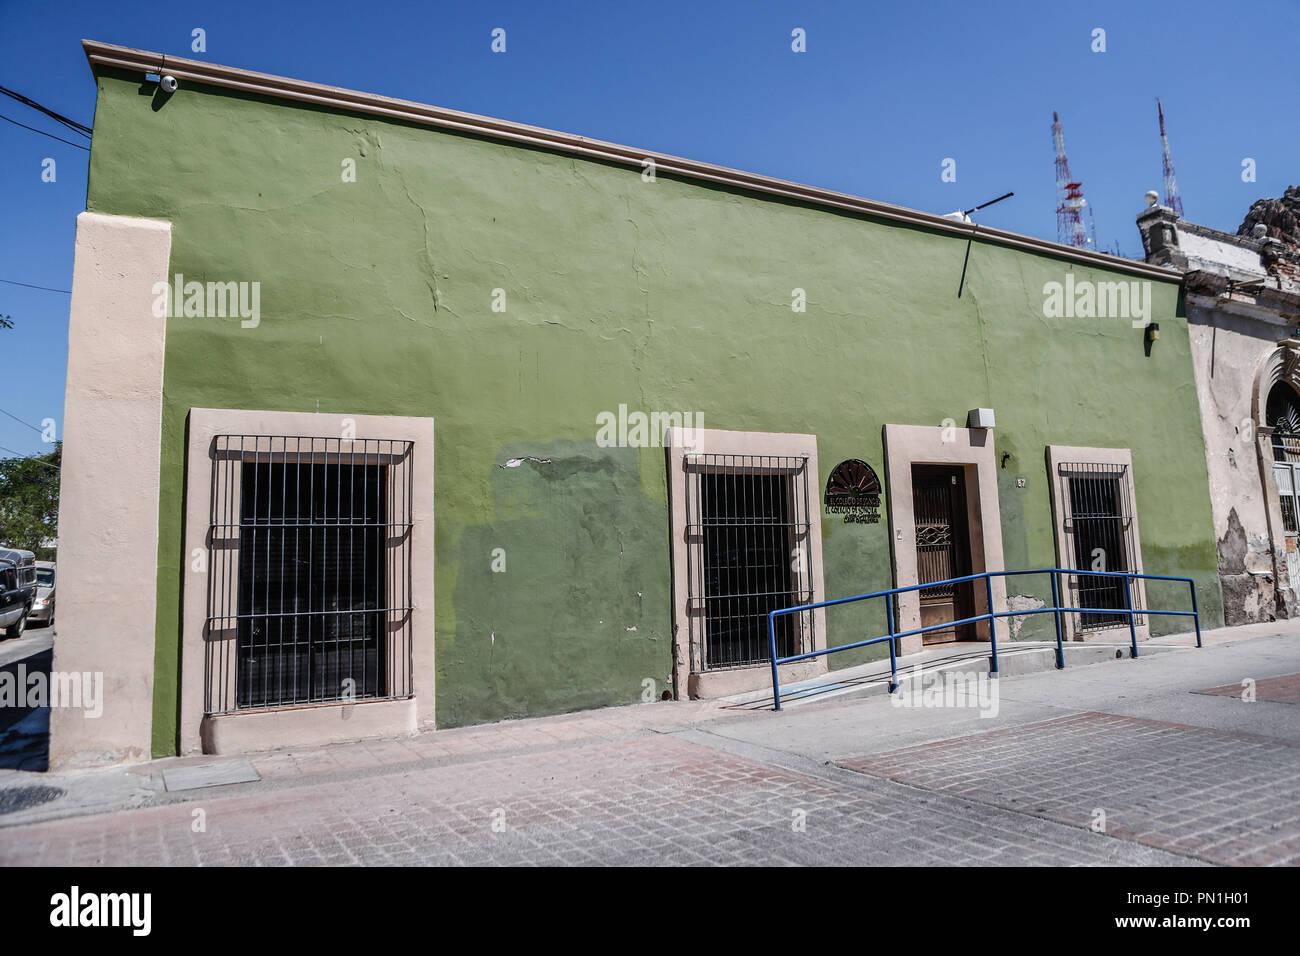 Casa Gardenia del Colegio Sonora el Centro histórico de Hermosillo, Sonora.  (Photo: Luis Gutierrez /NortePhoto)   Pclaves: Fachada, outdoors, casa, a Stock Photo